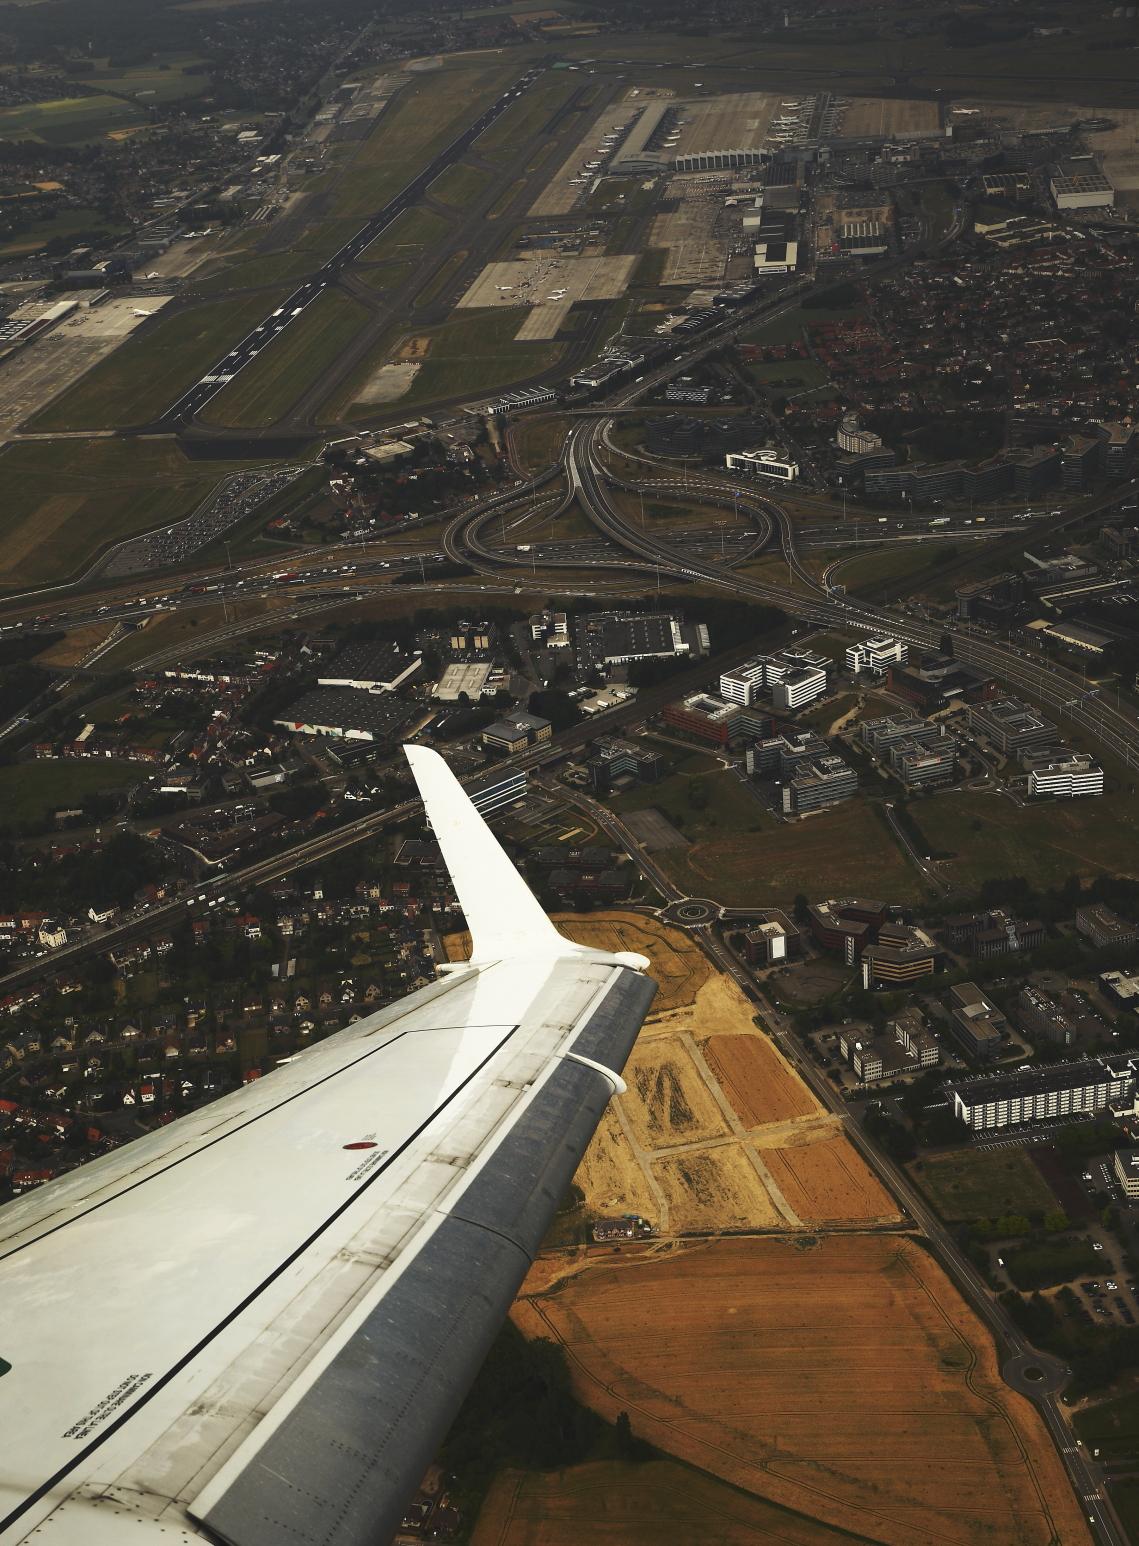 Brussel > Milan AZ149